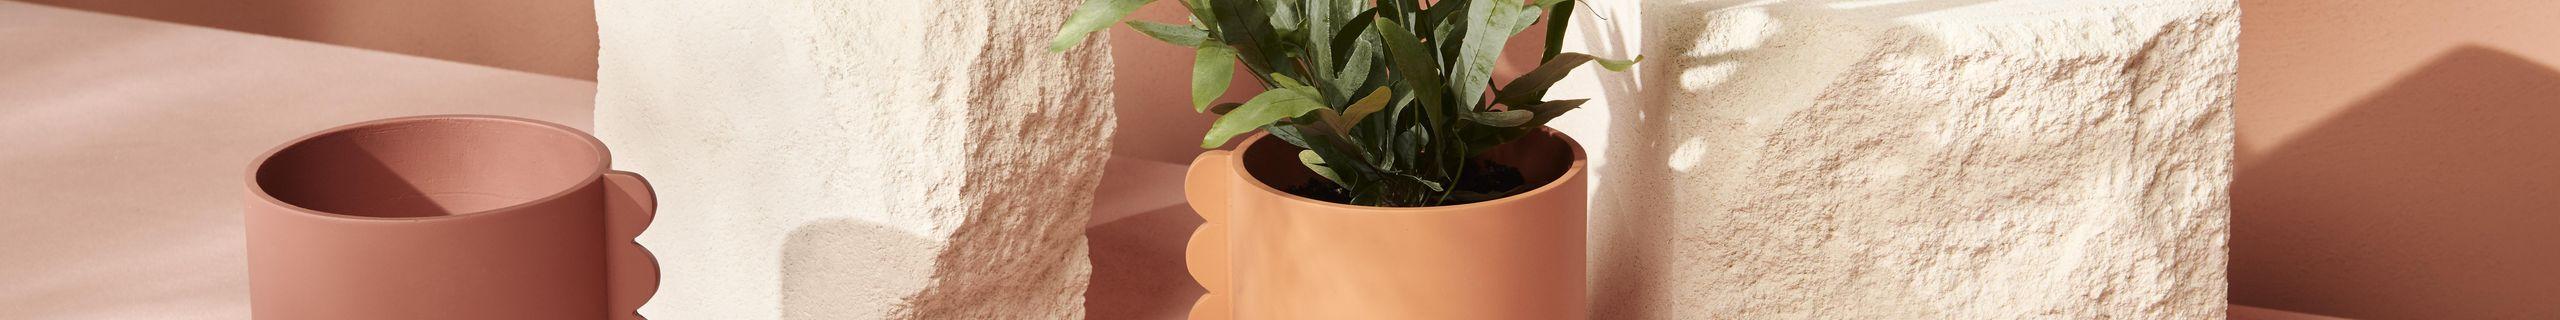 Feature Pot_Frill